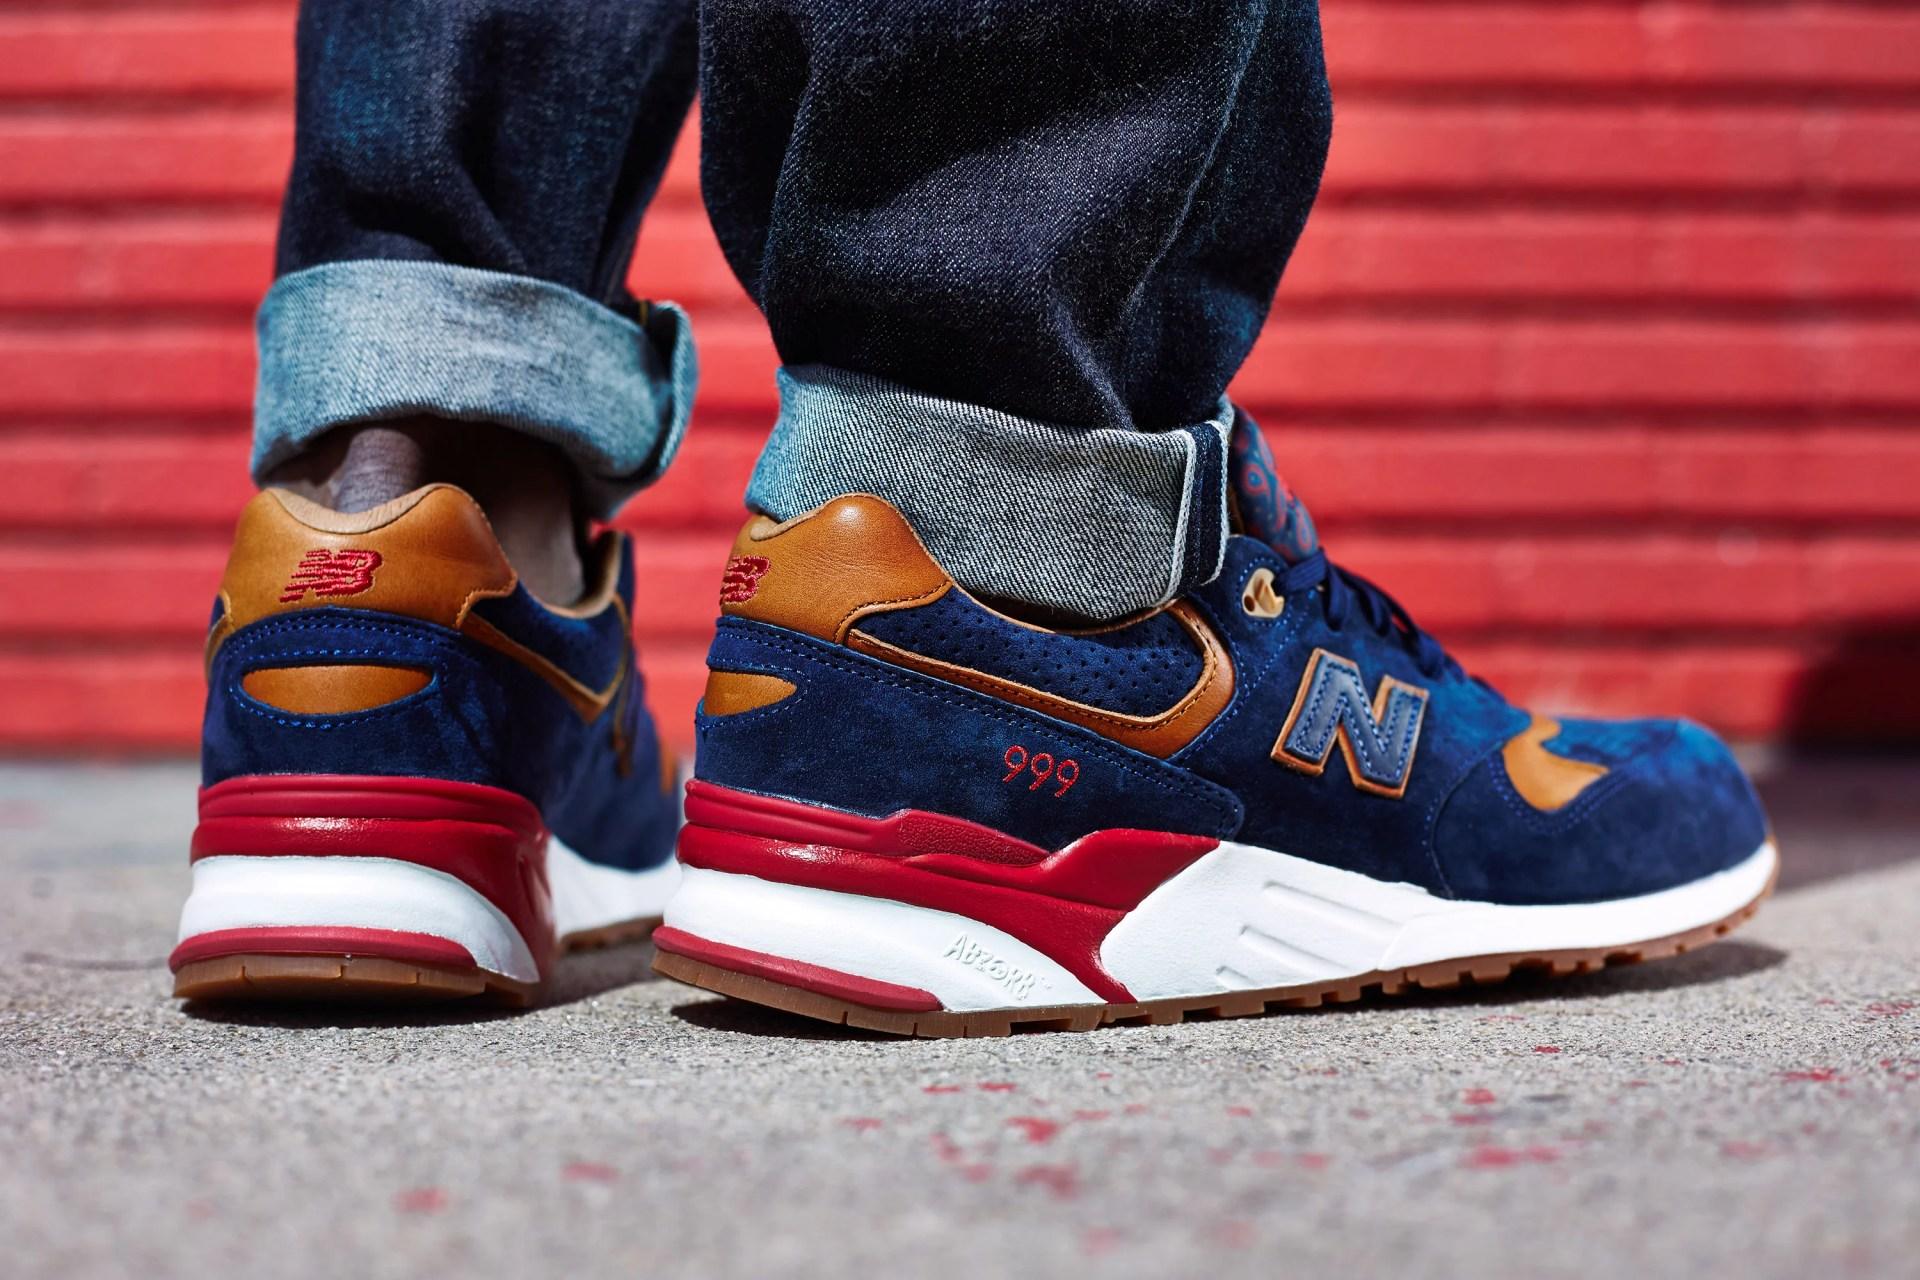 reputable site b74e8 c9d6c On-Foot Look // Sneaker Politics x New Balance 999 | Nice Kicks